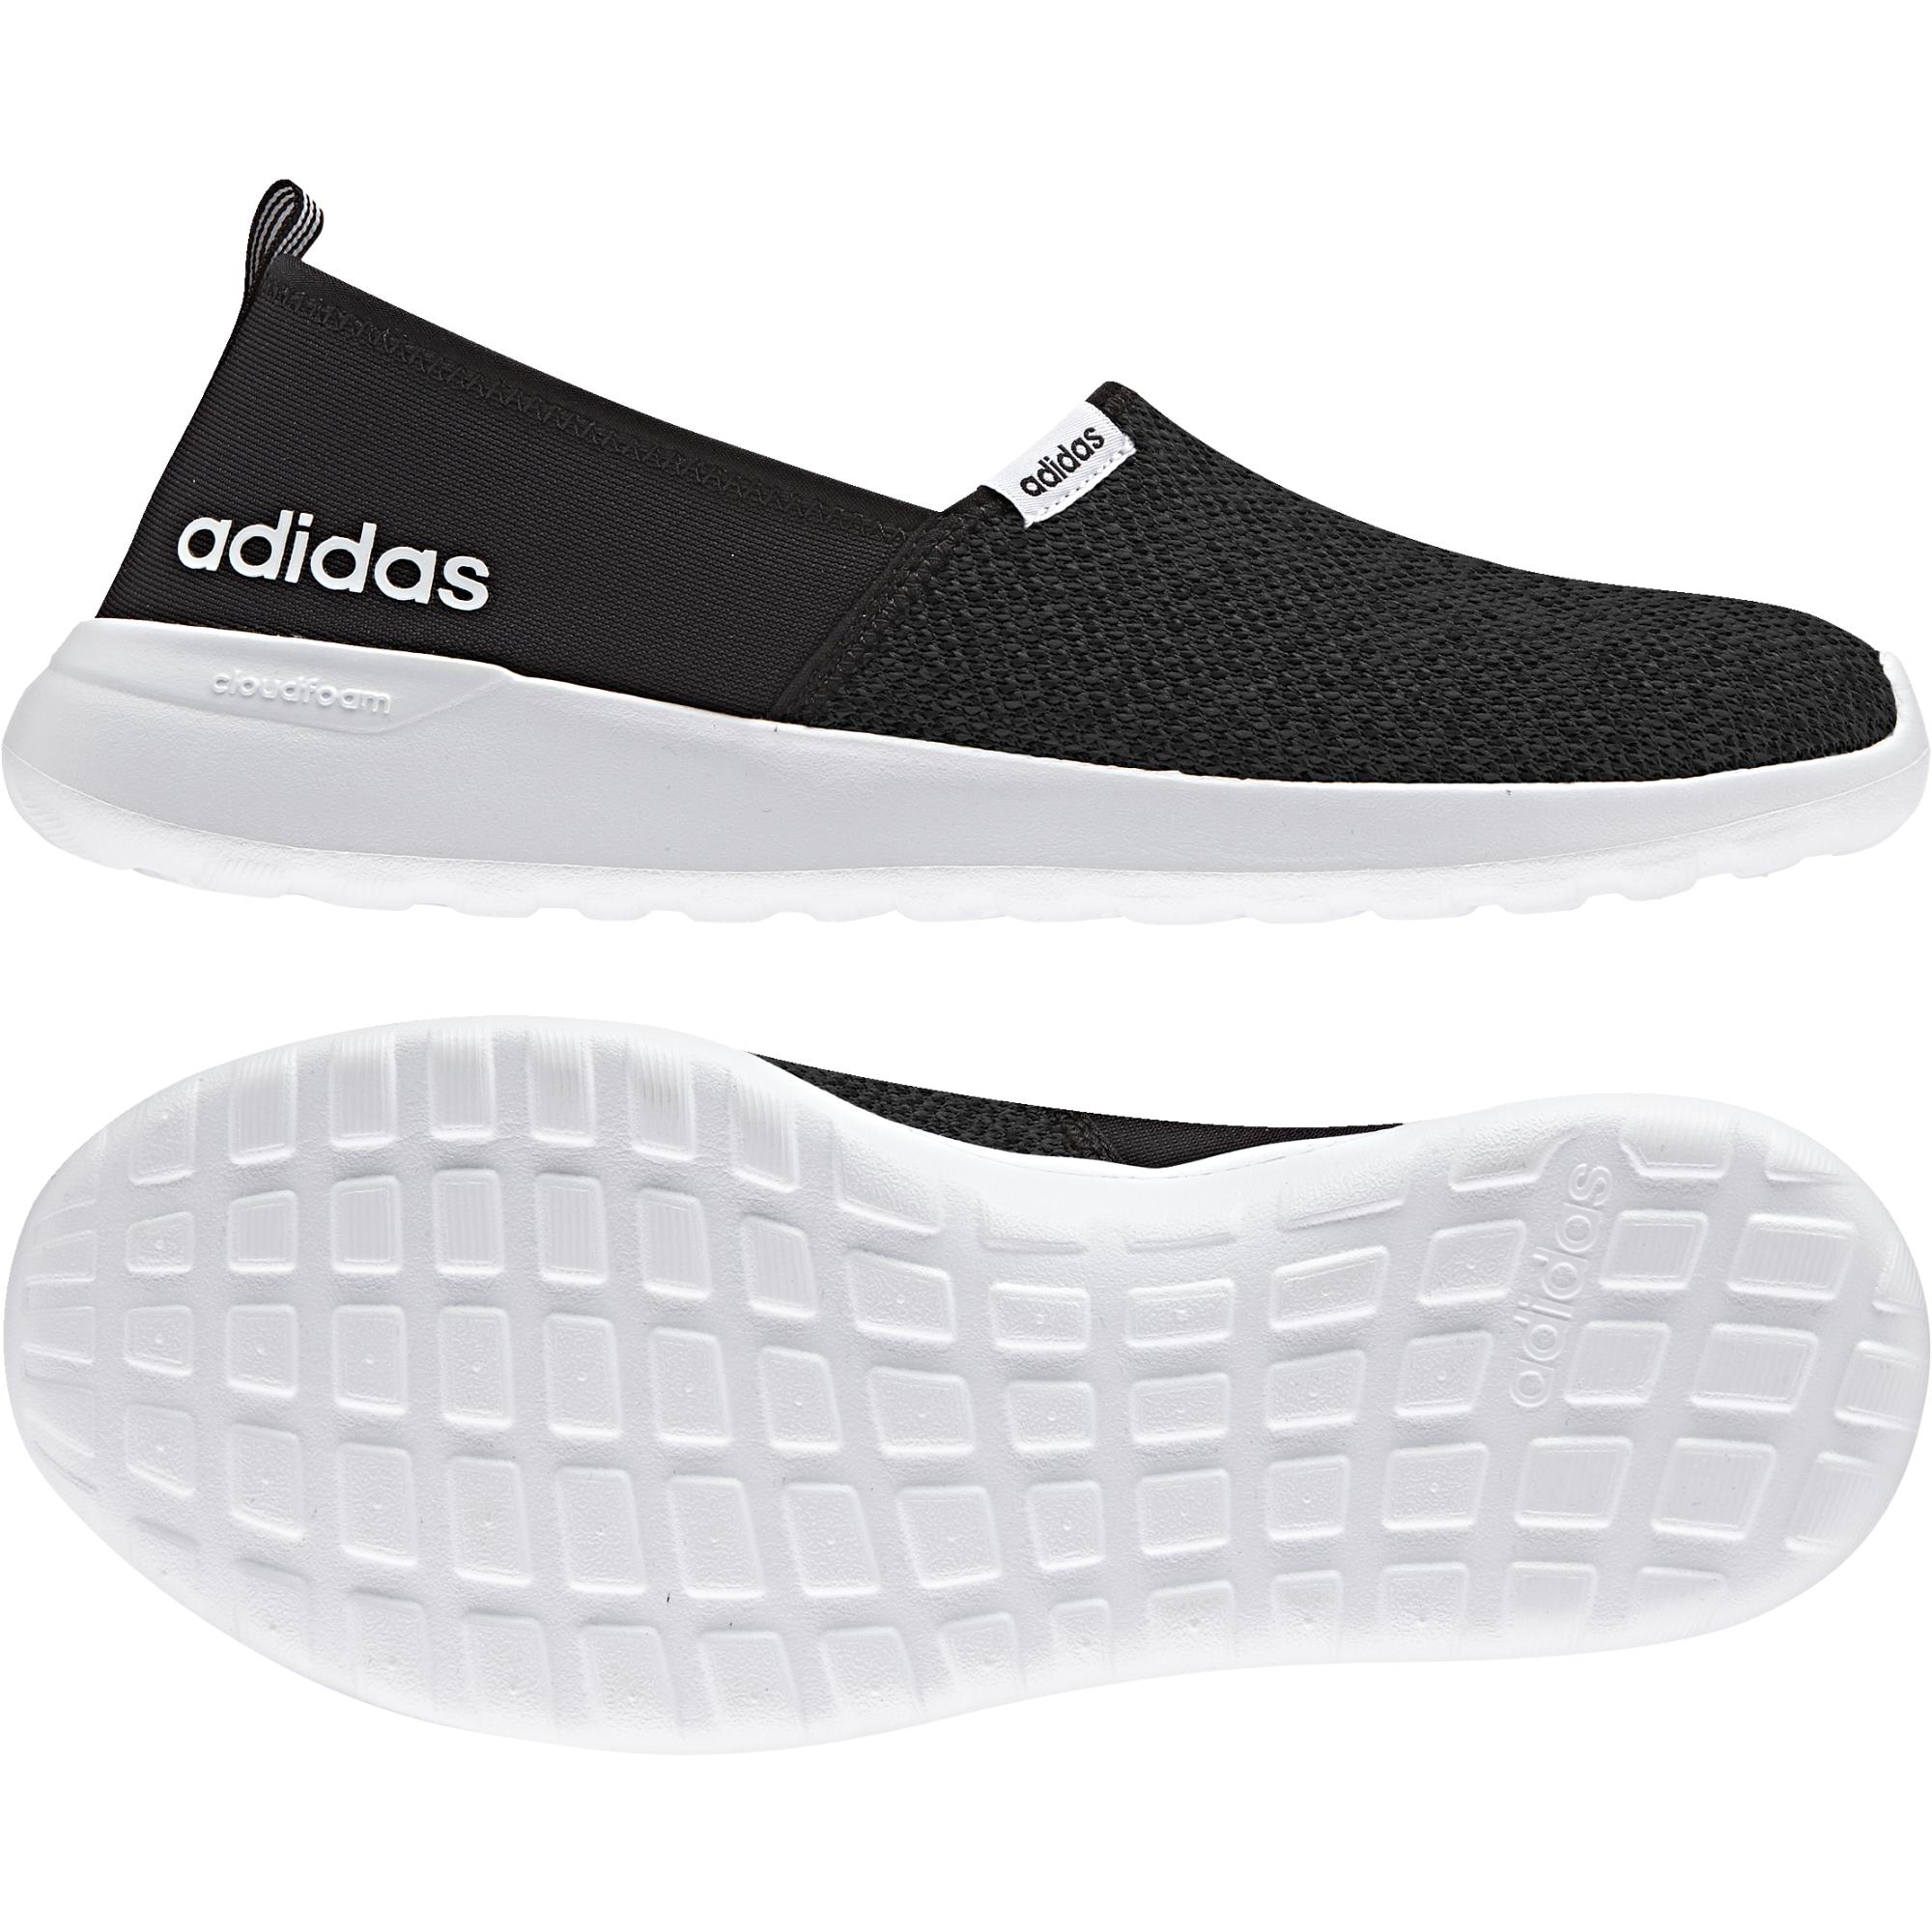 Adidas Cloudfoam Lite Racer női utcai cipő  46637f11a7